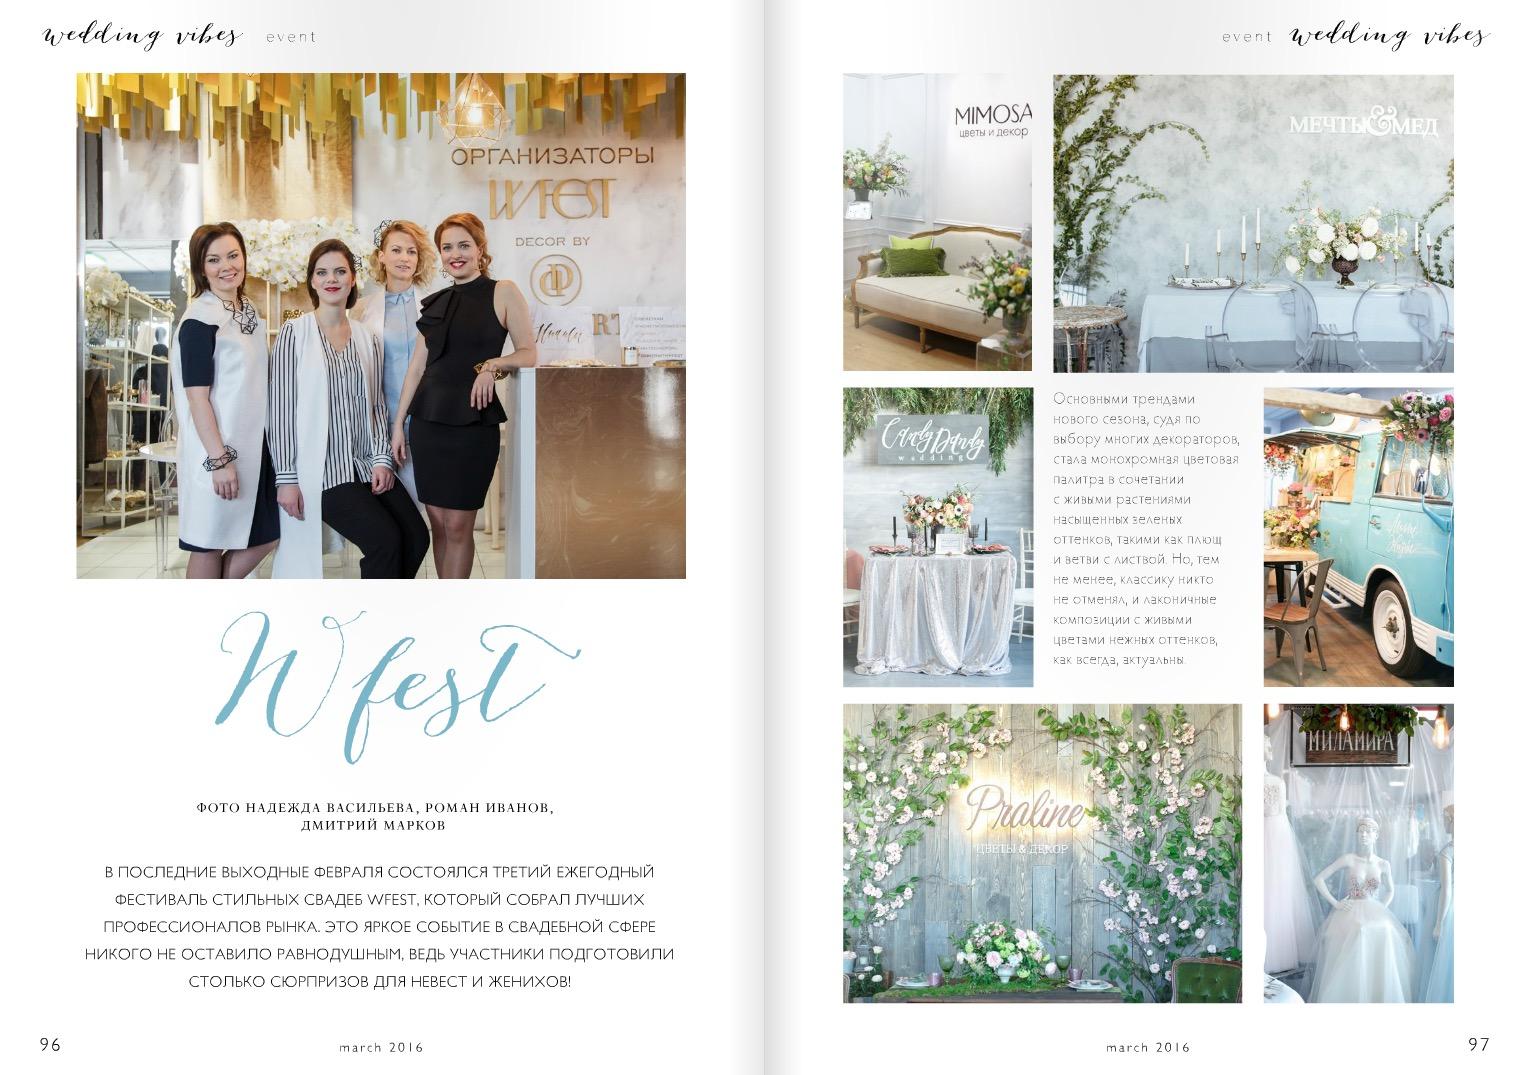 March 2016,  Wed Vibes magazine , Wfest https://issuu.com/weddingvibes/docs/issue_4